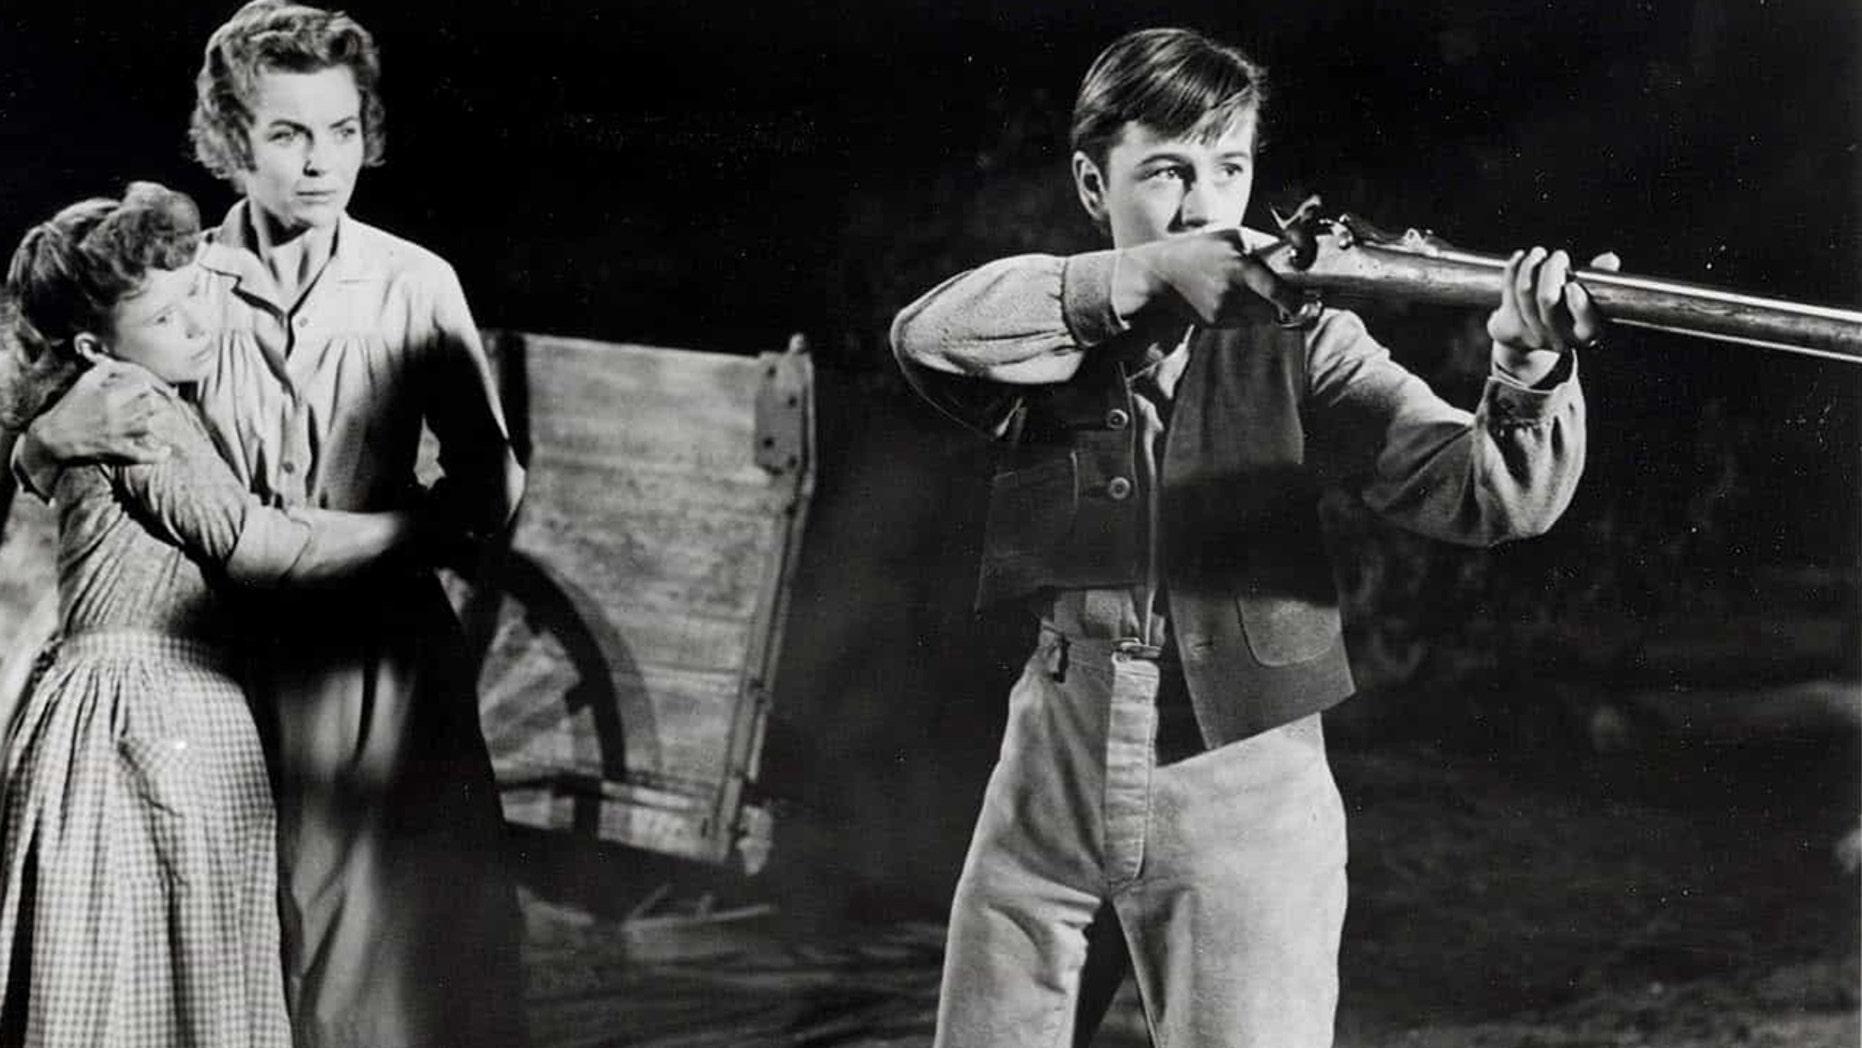 '50s child star Beverly Washburn recalls filming Disney's 'Old Yeller': 'It destroyed' grown men